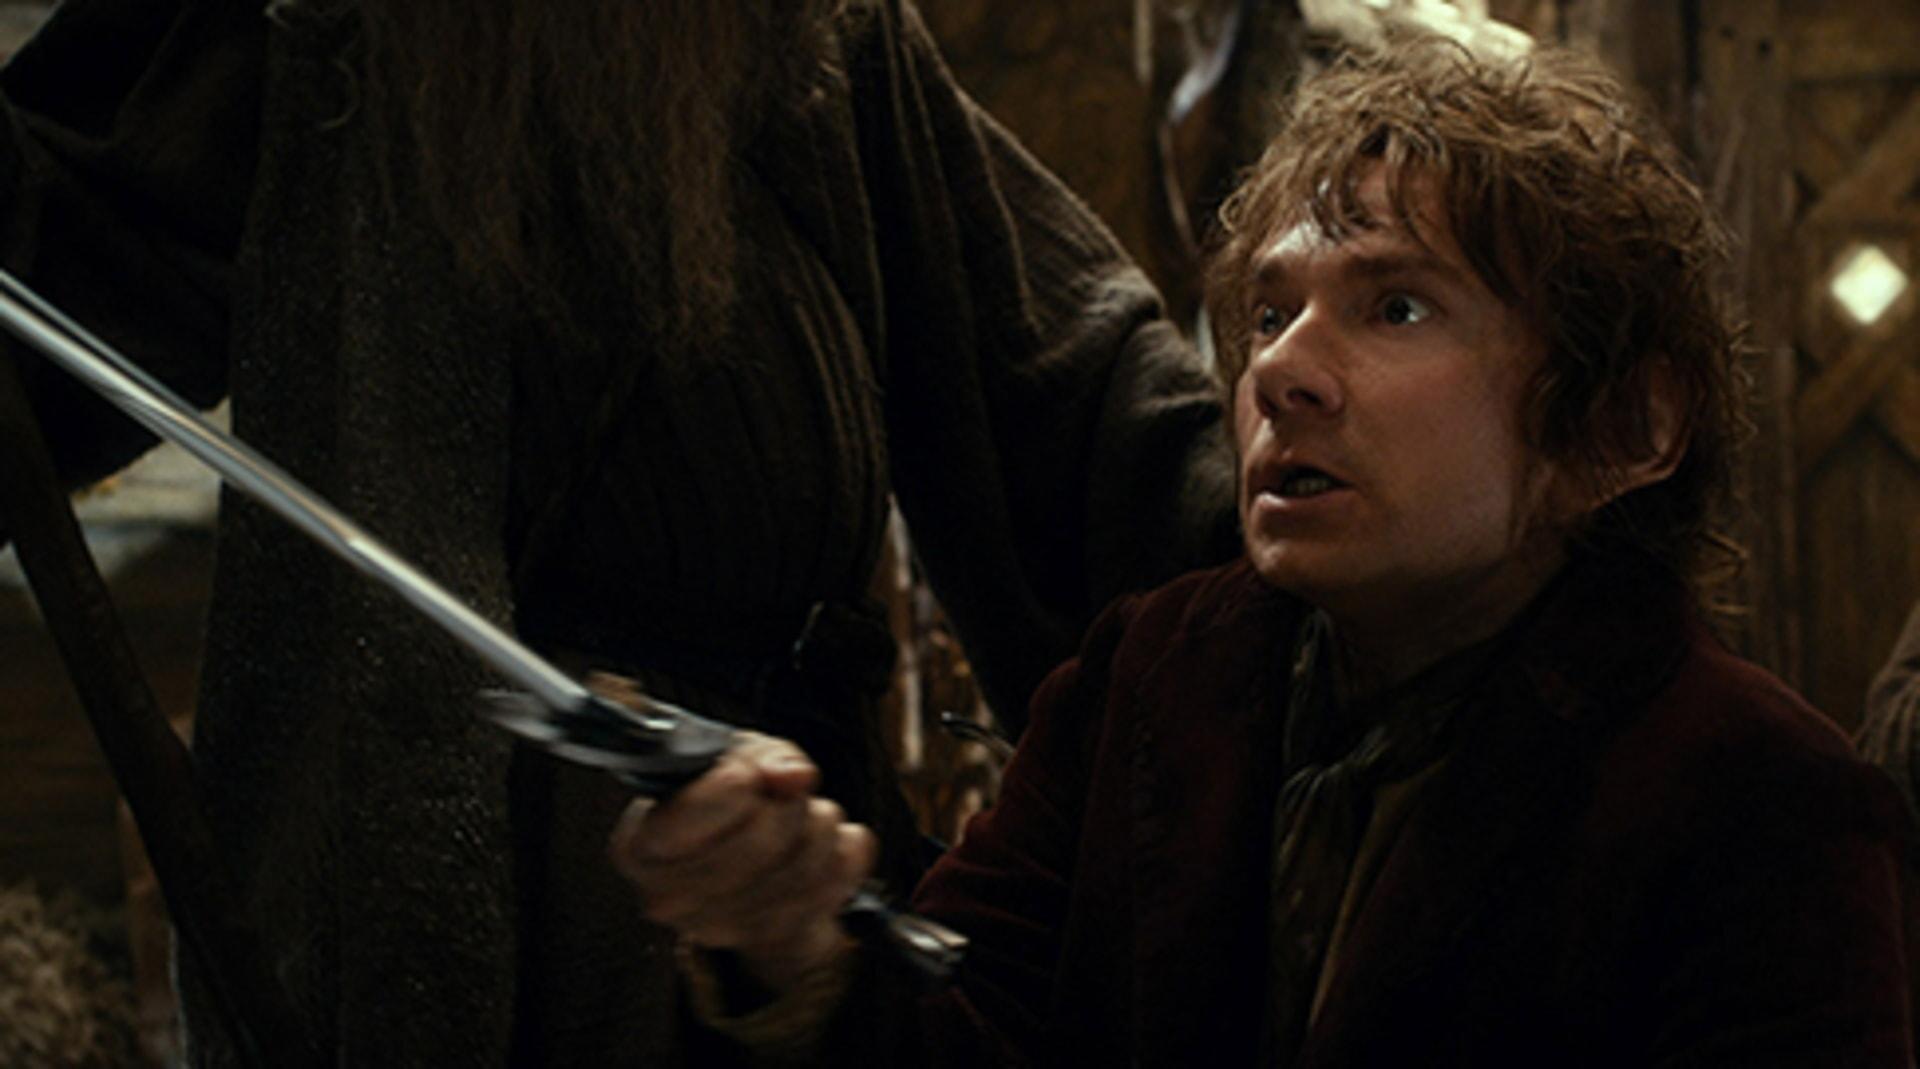 The Hobbit: The Desolation of Smaug - Image 4